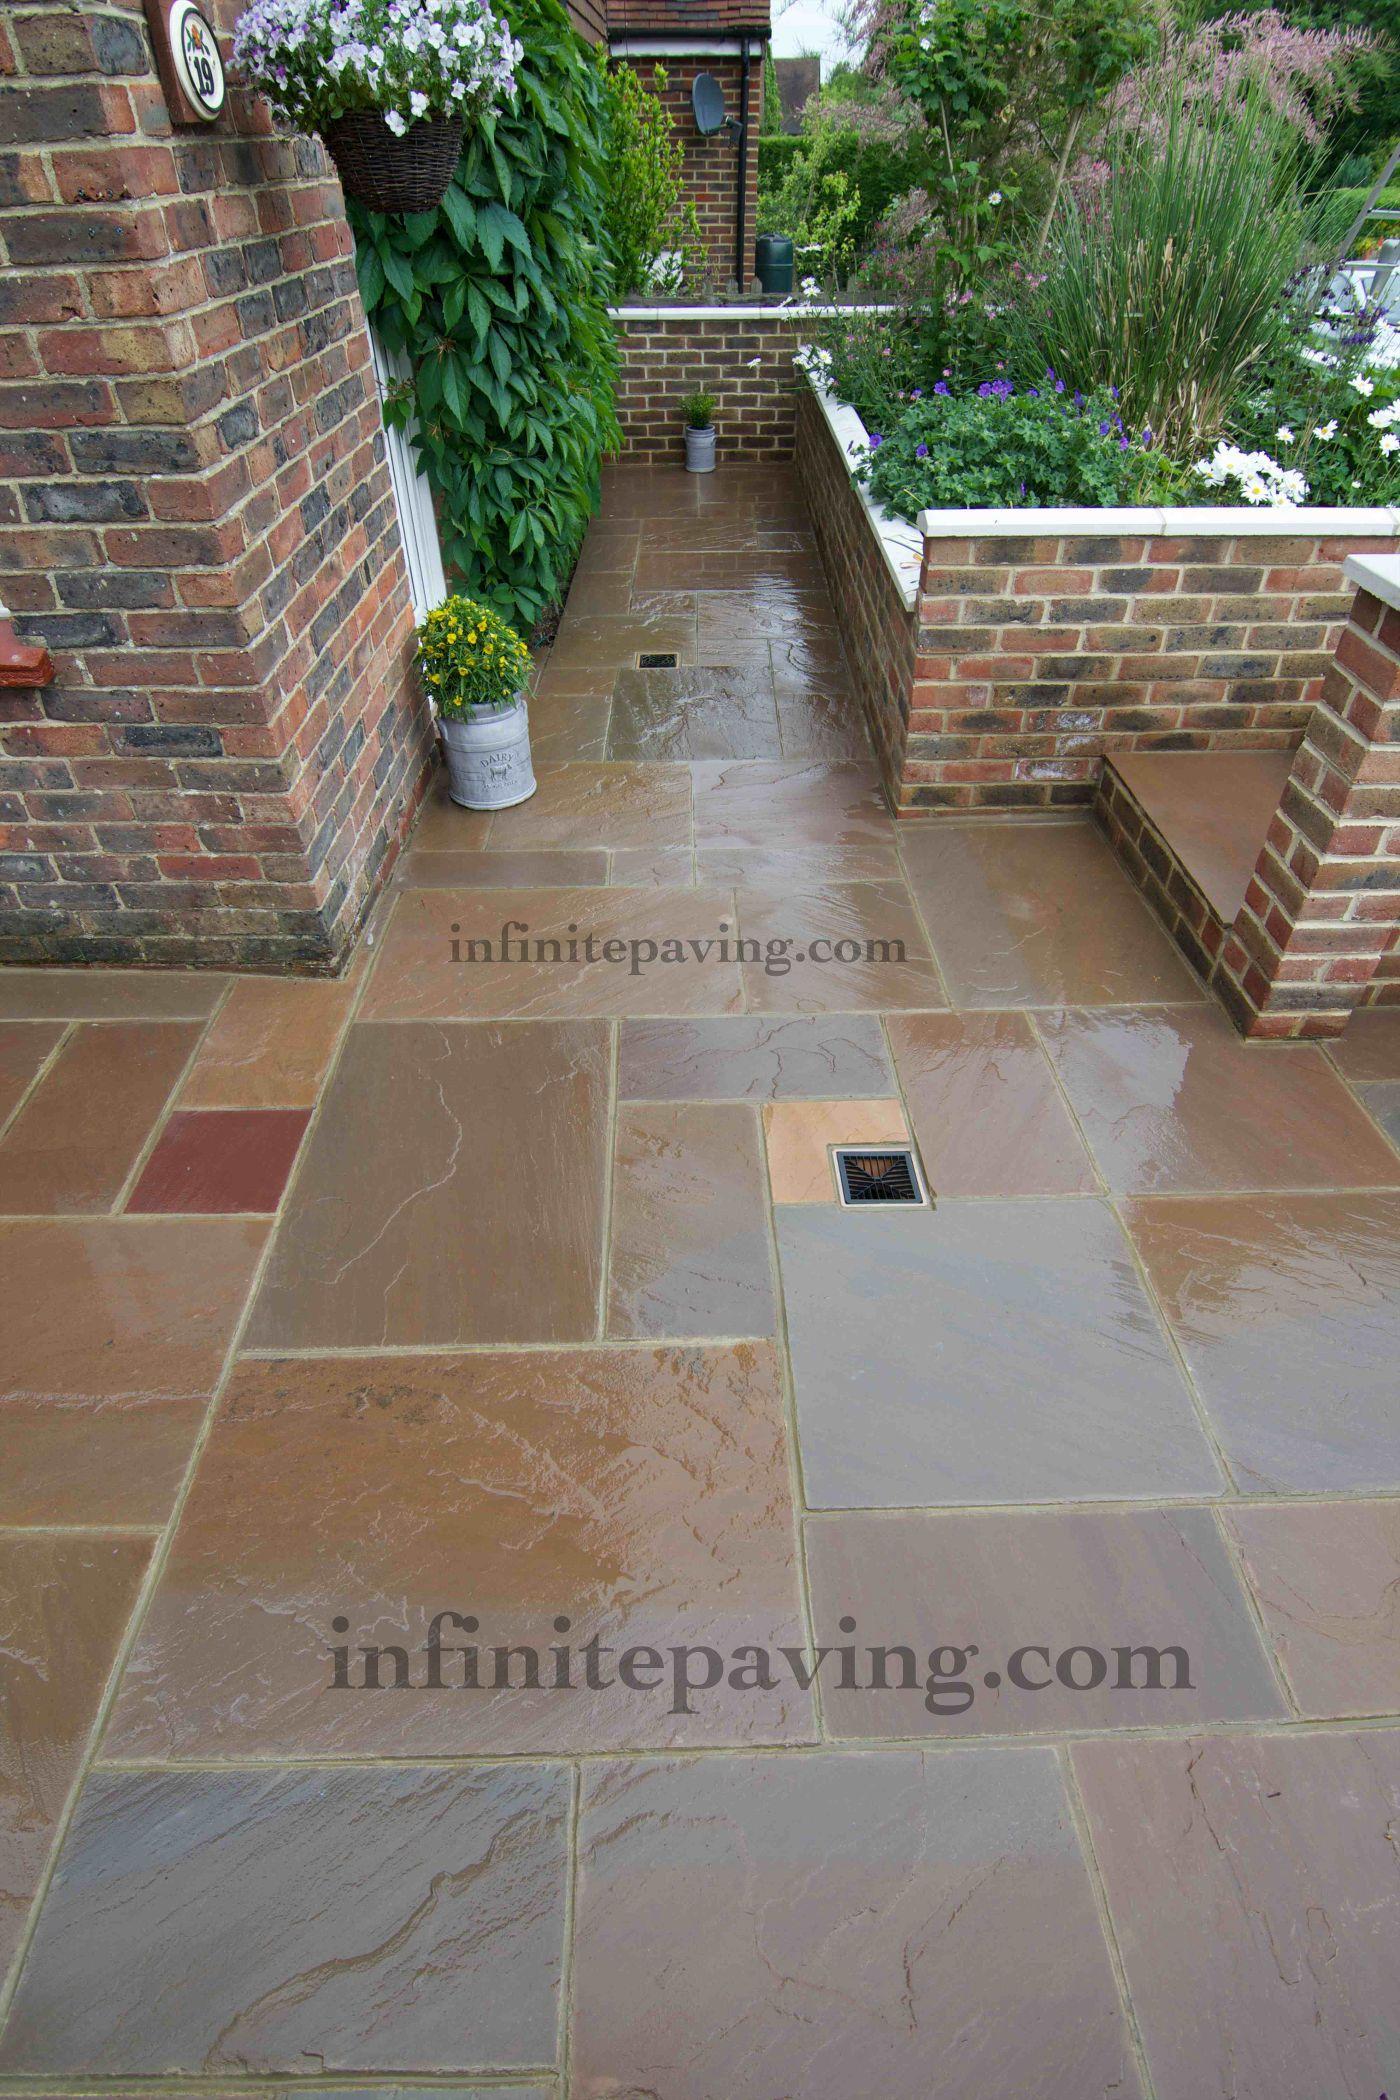 Infinitepaving high quality natural stone paving, Indian